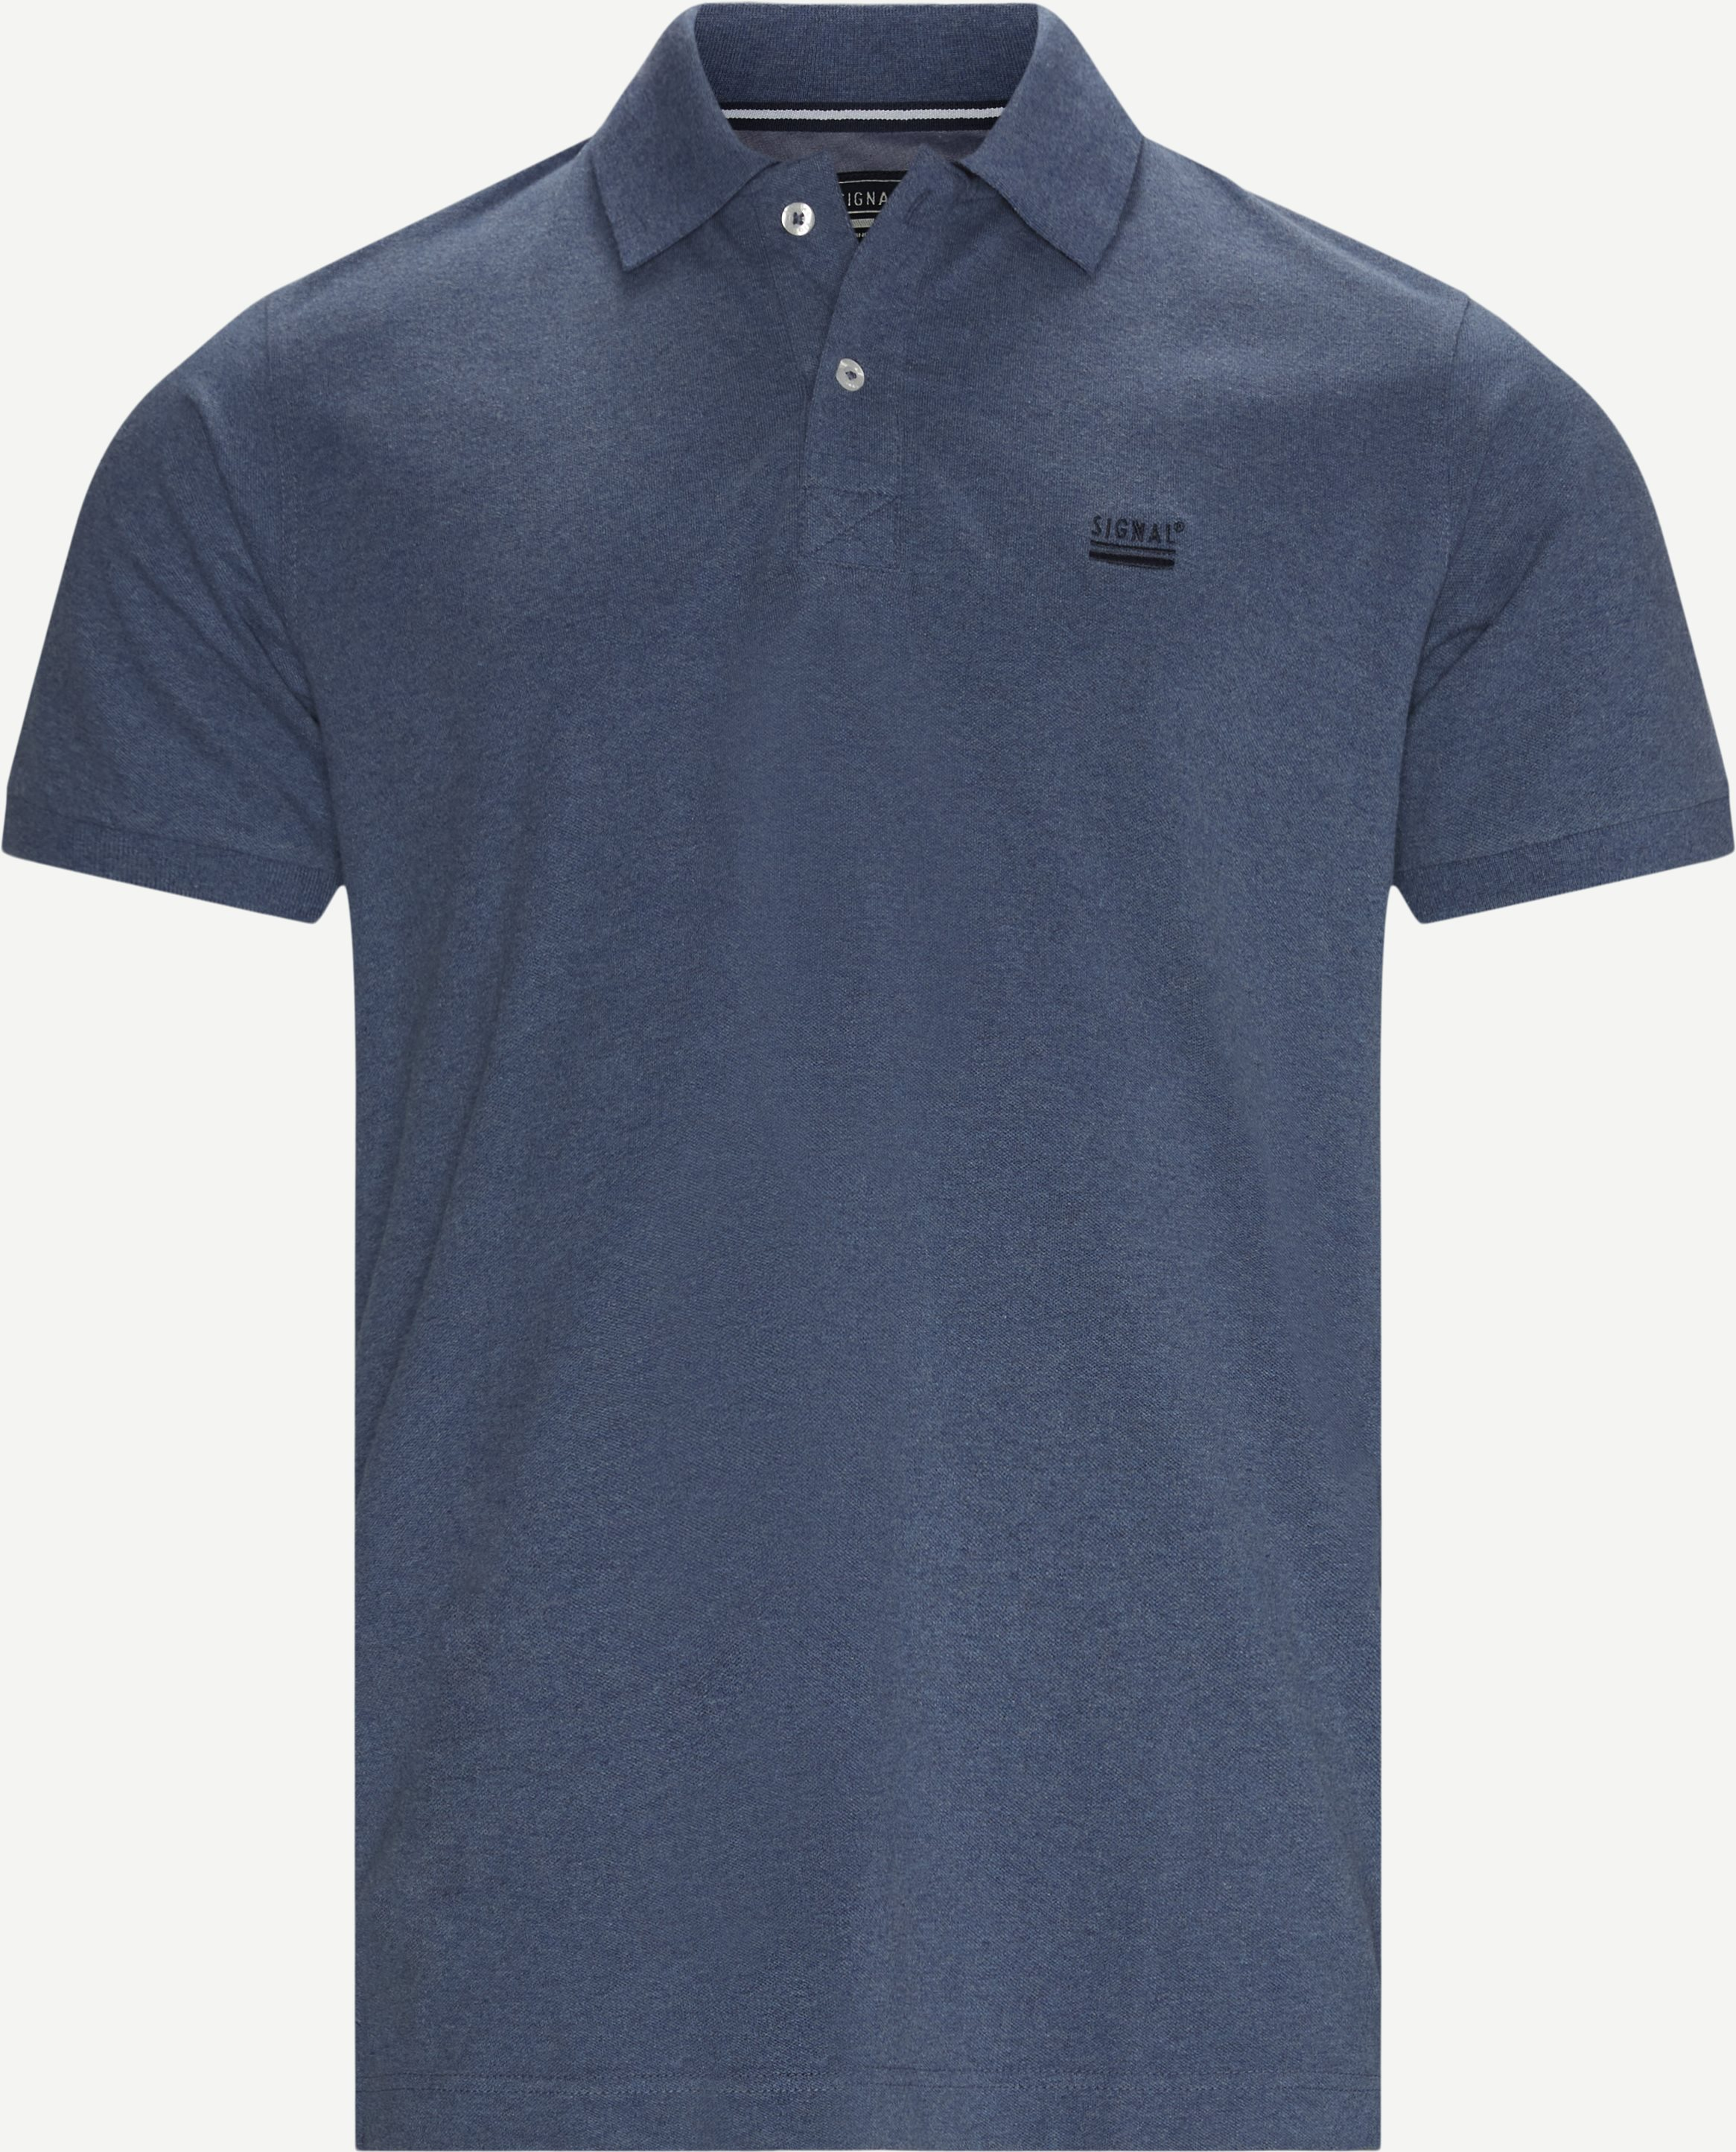 Nors Polo T-shirt - T-shirts - Regular fit - Denim